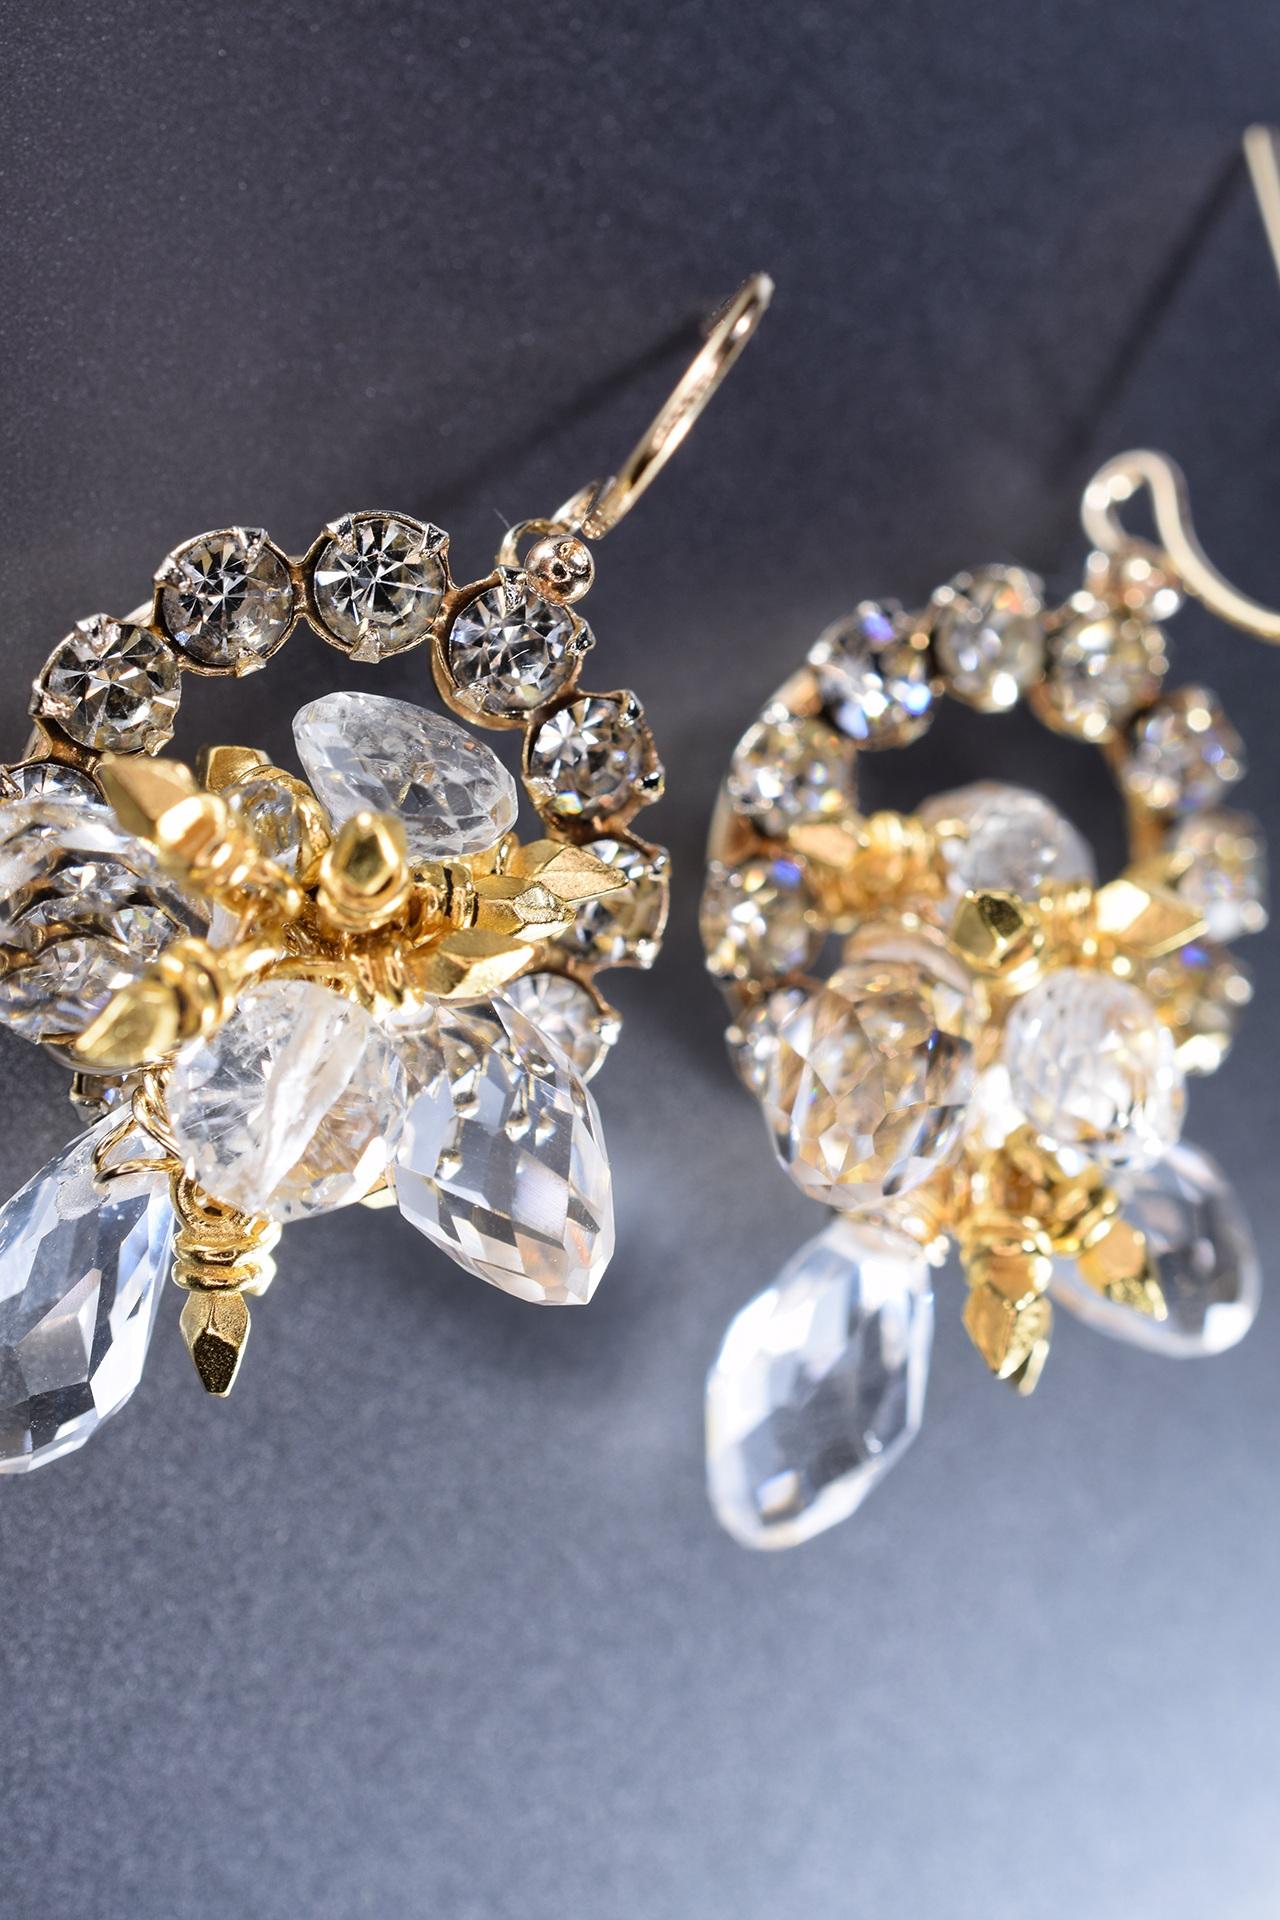 custom earrings gold and crystal rhinestones